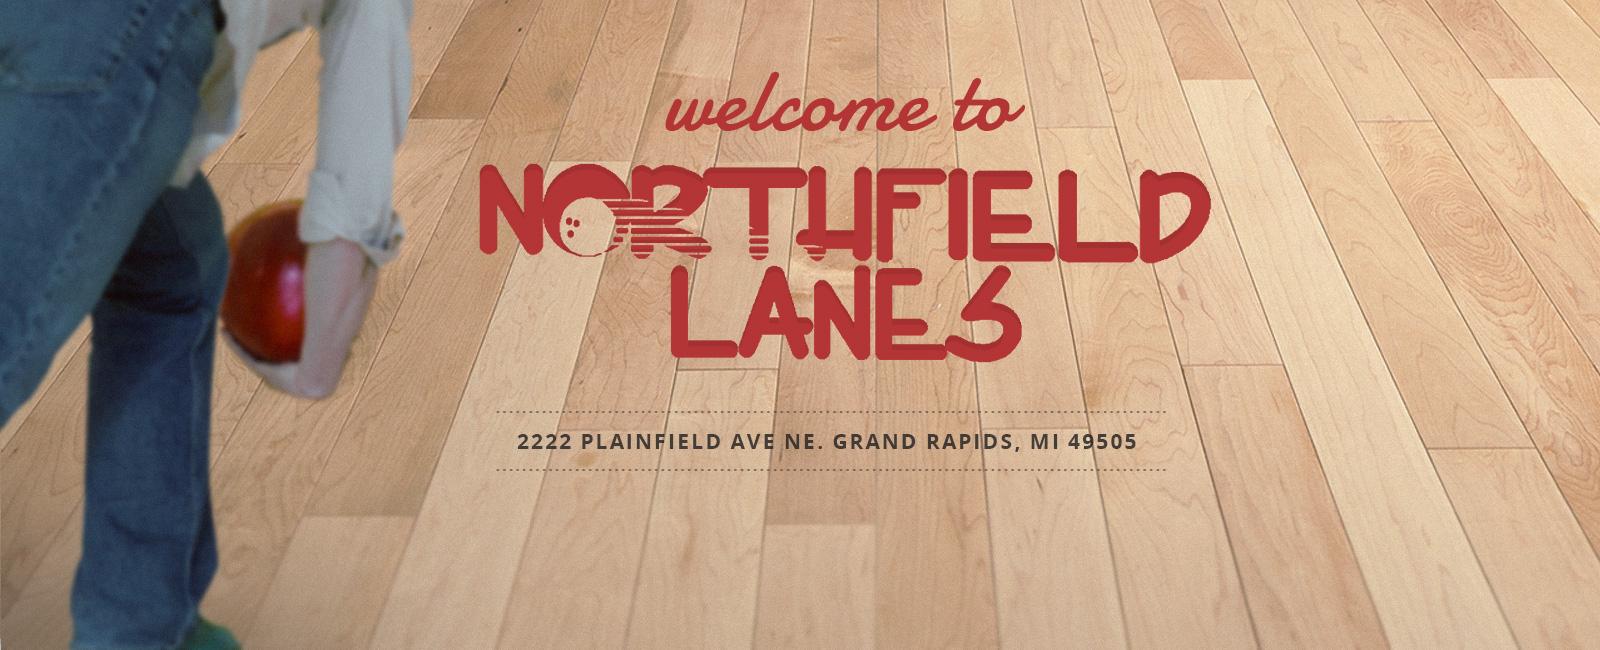 northfield lanes